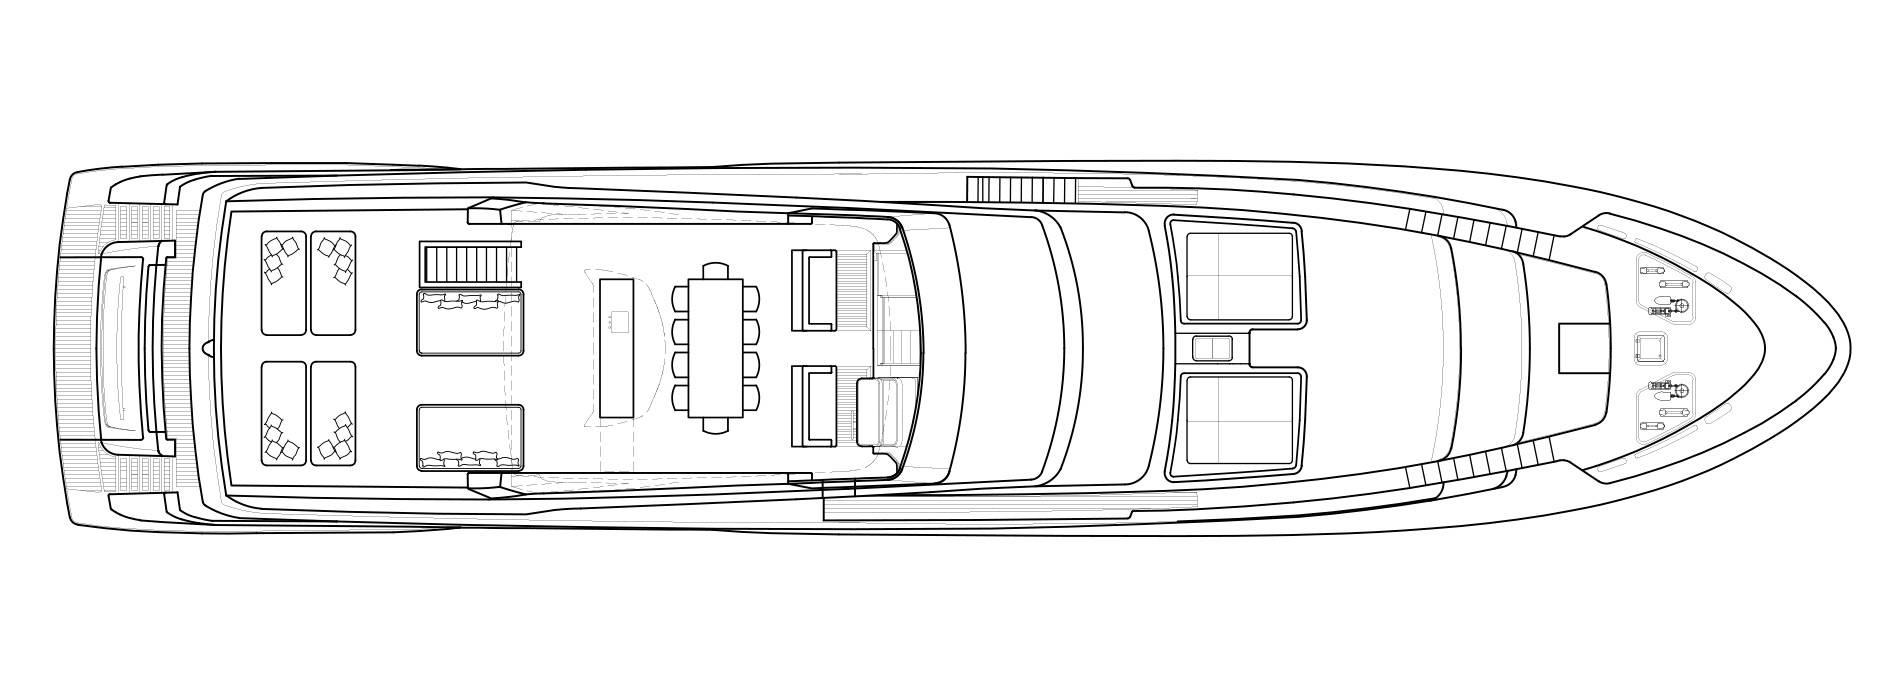 Sanlorenzo Yachts SL118 Flying bridge